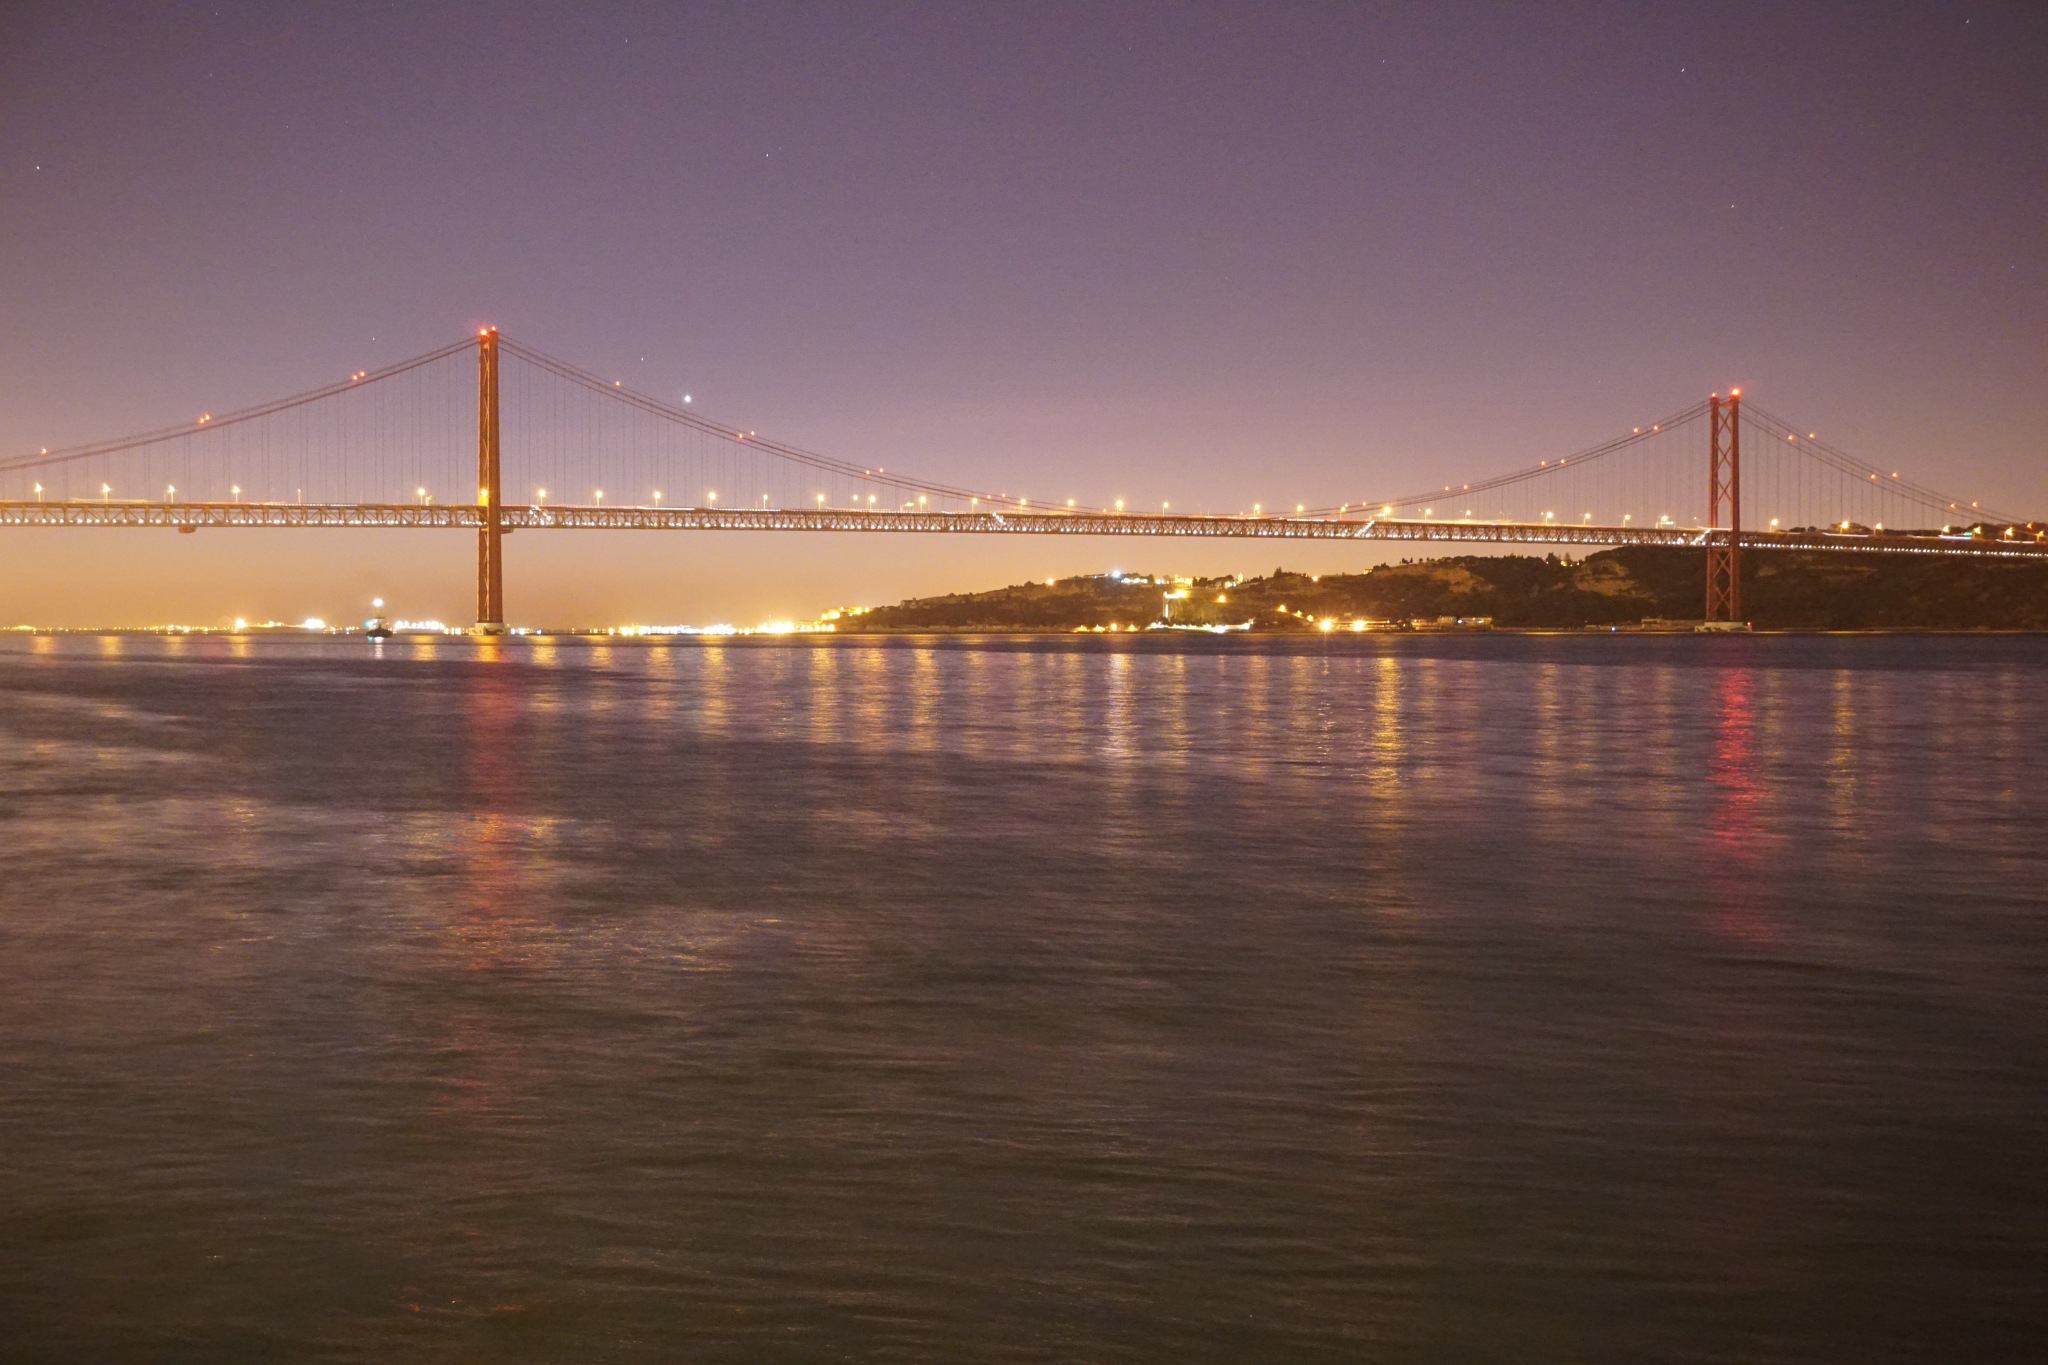 Bridge before the sun wakes up by Carlos Rosa Ferreira